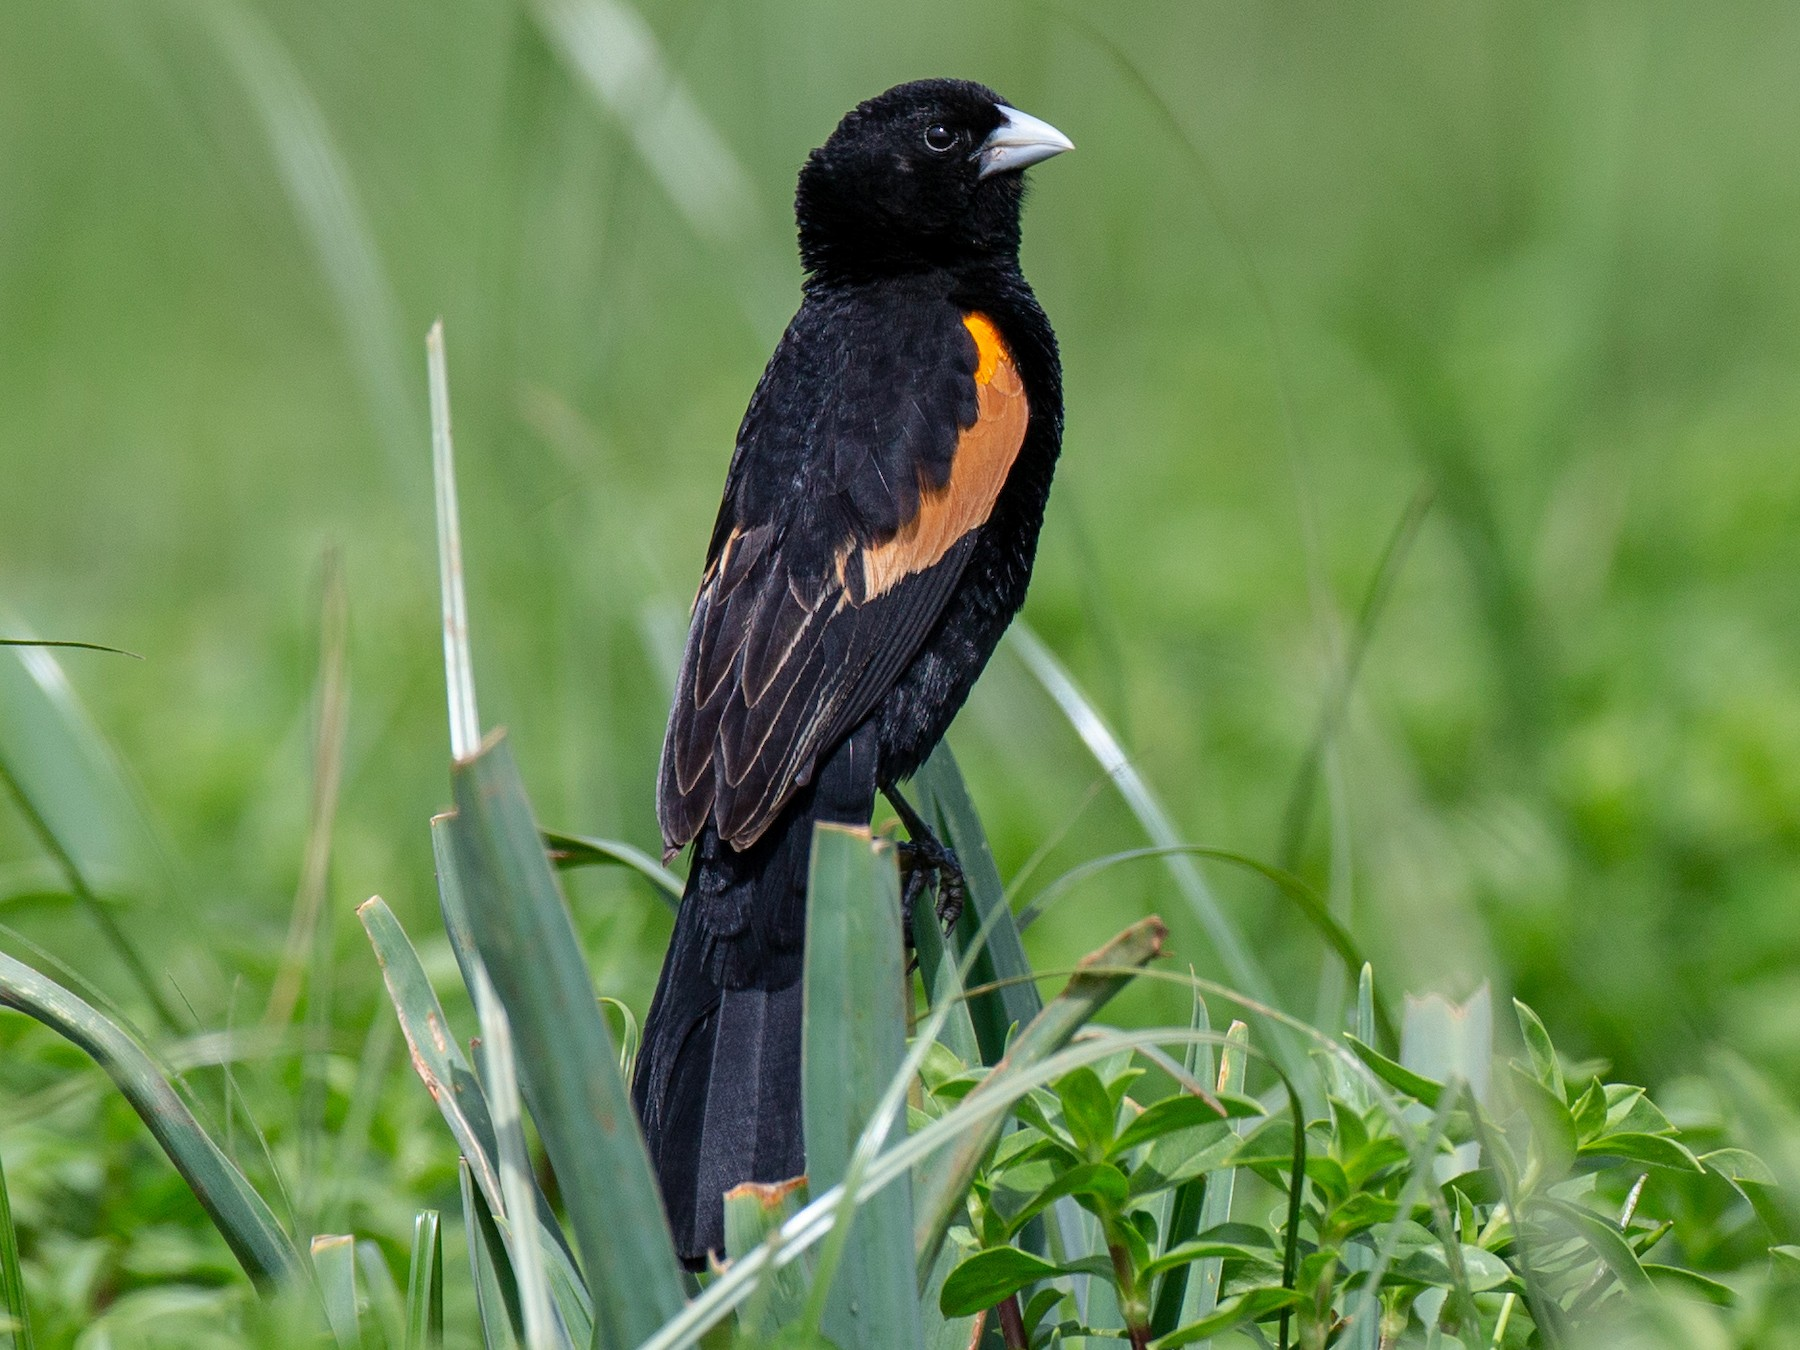 Fan-tailed Widowbird - Chris Wood